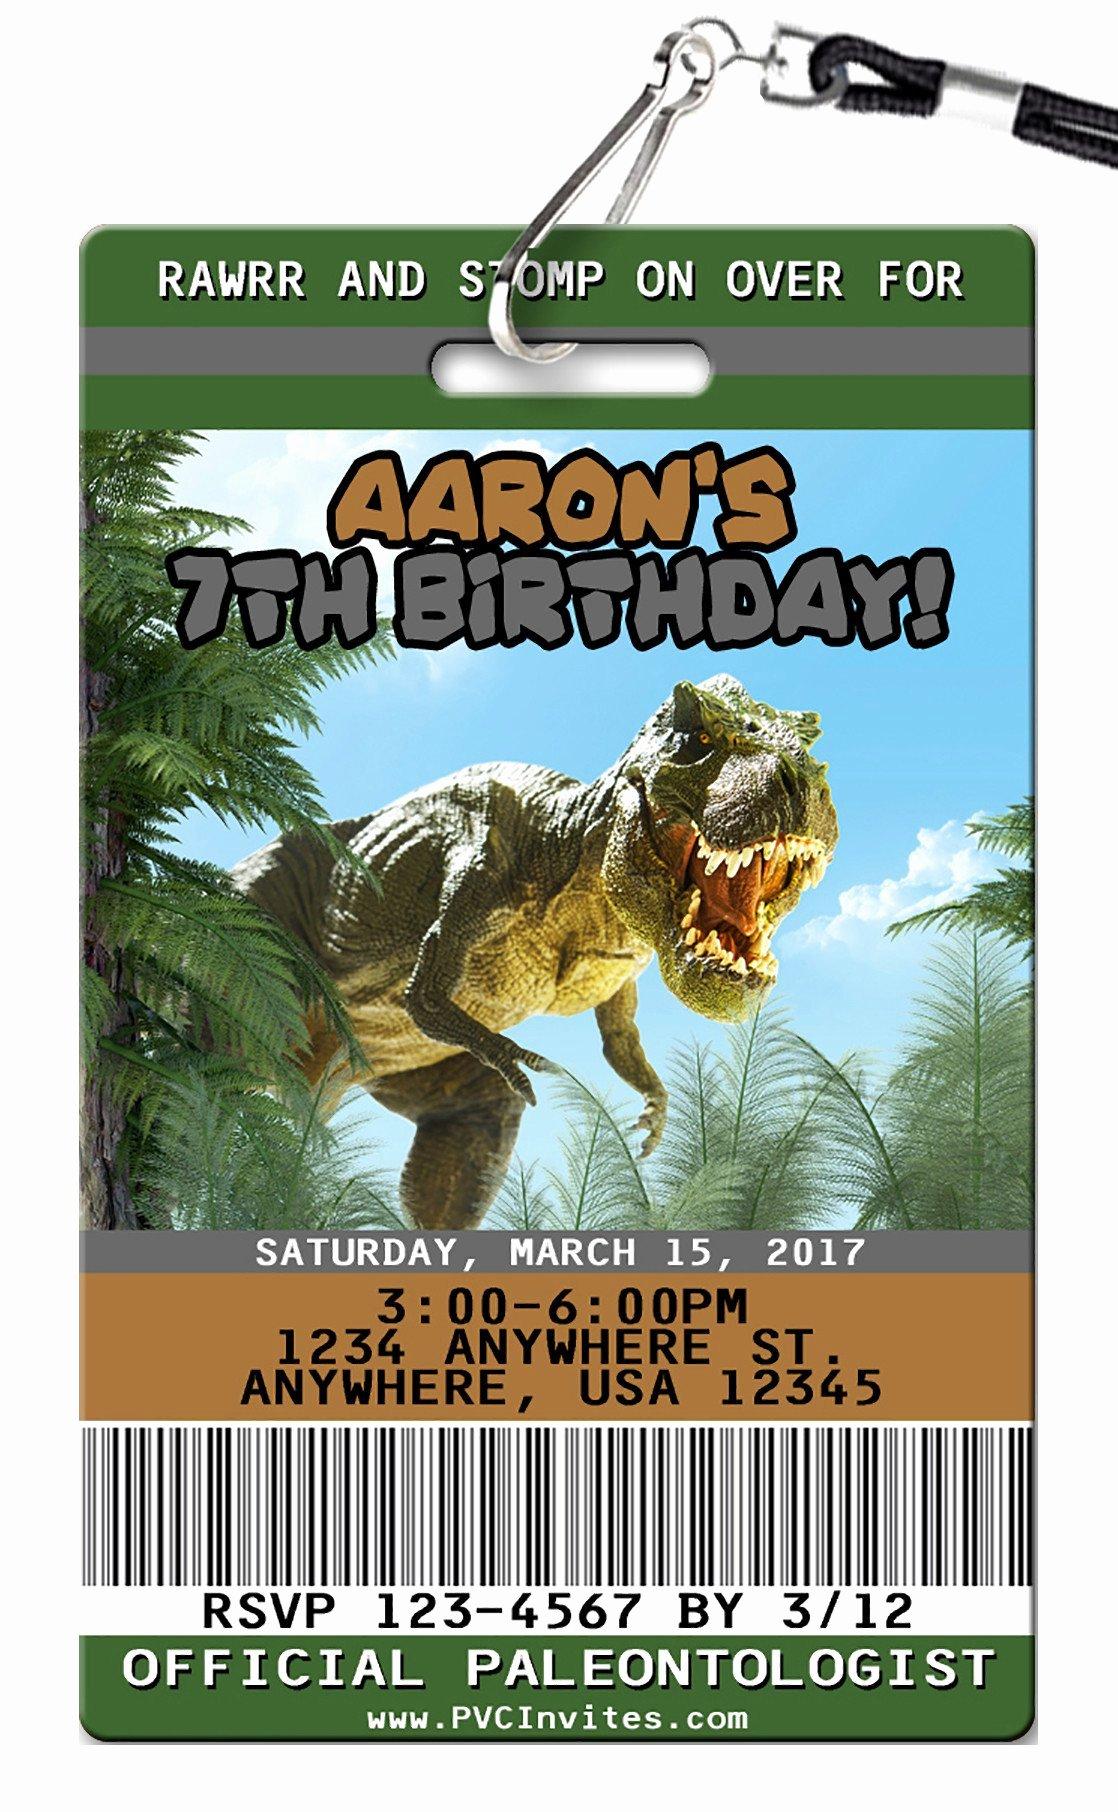 Dinosaur Birthday Invitations Free Best Of Dinosaur Birthday Invitations Pvc Invites Vip Birthday Invitations